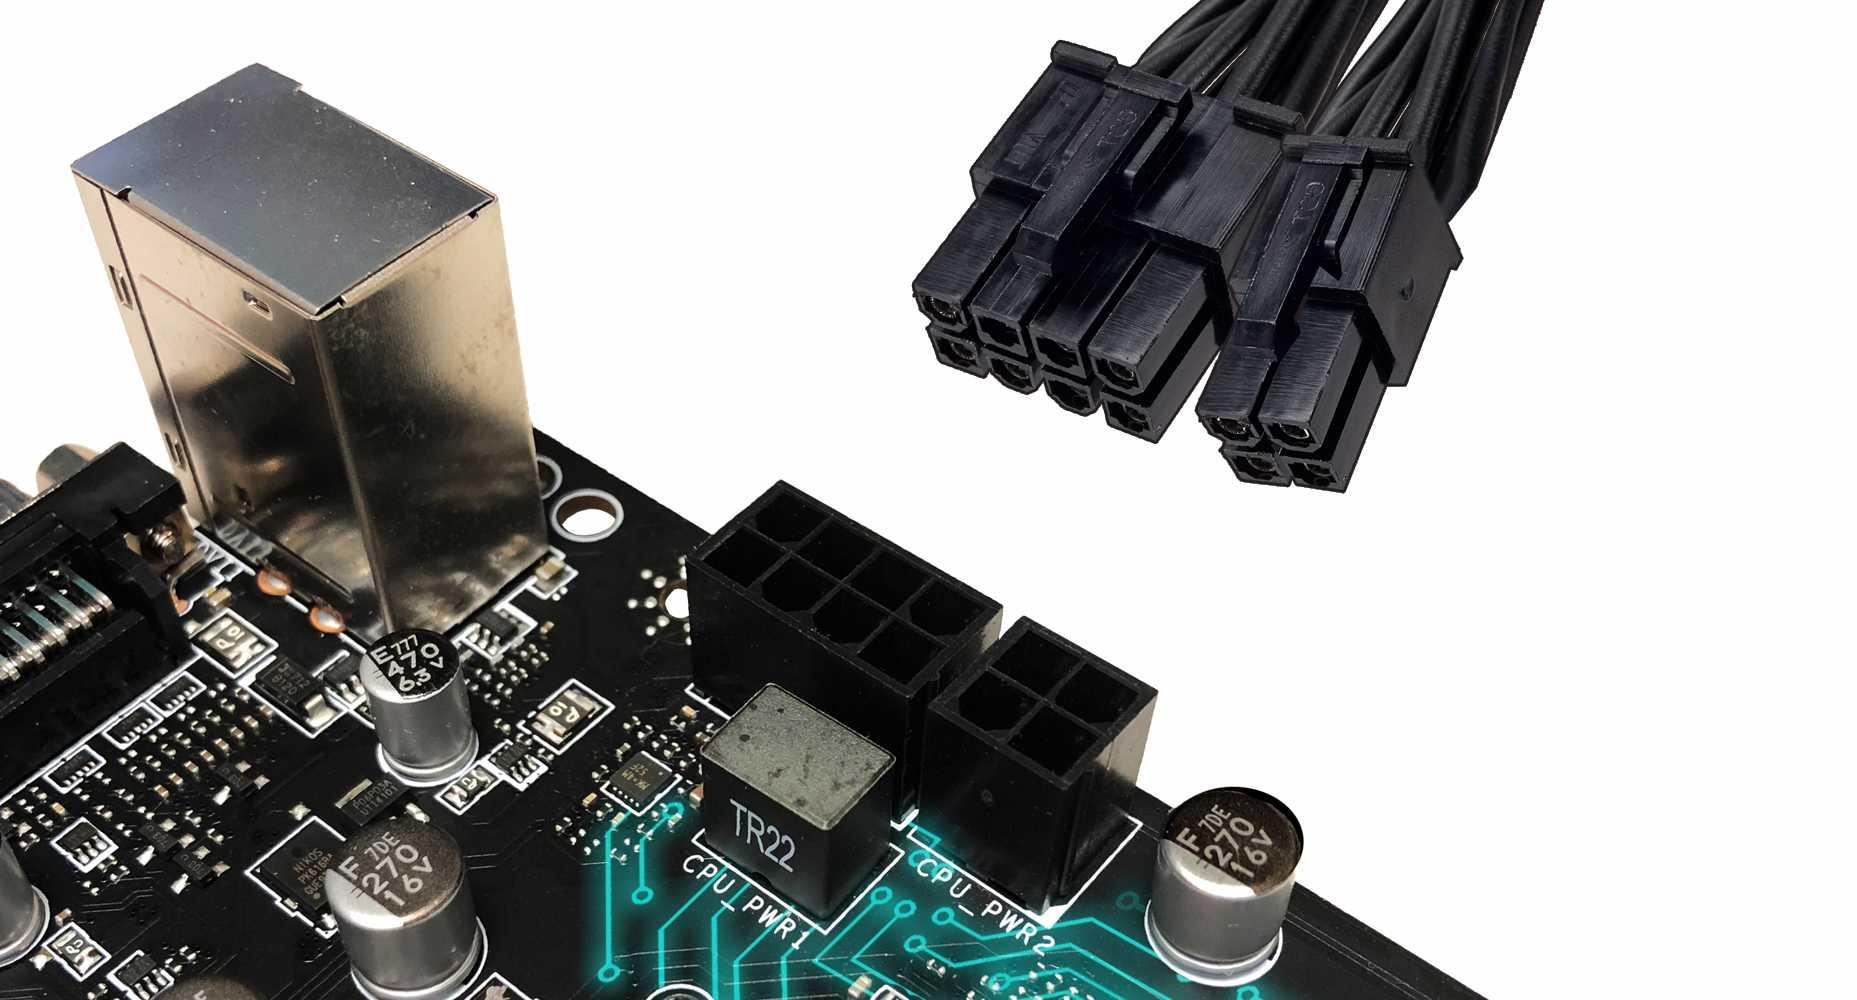 MSI MAG Z490 TOMAHAWK 8+4 POWER CONNECTORS